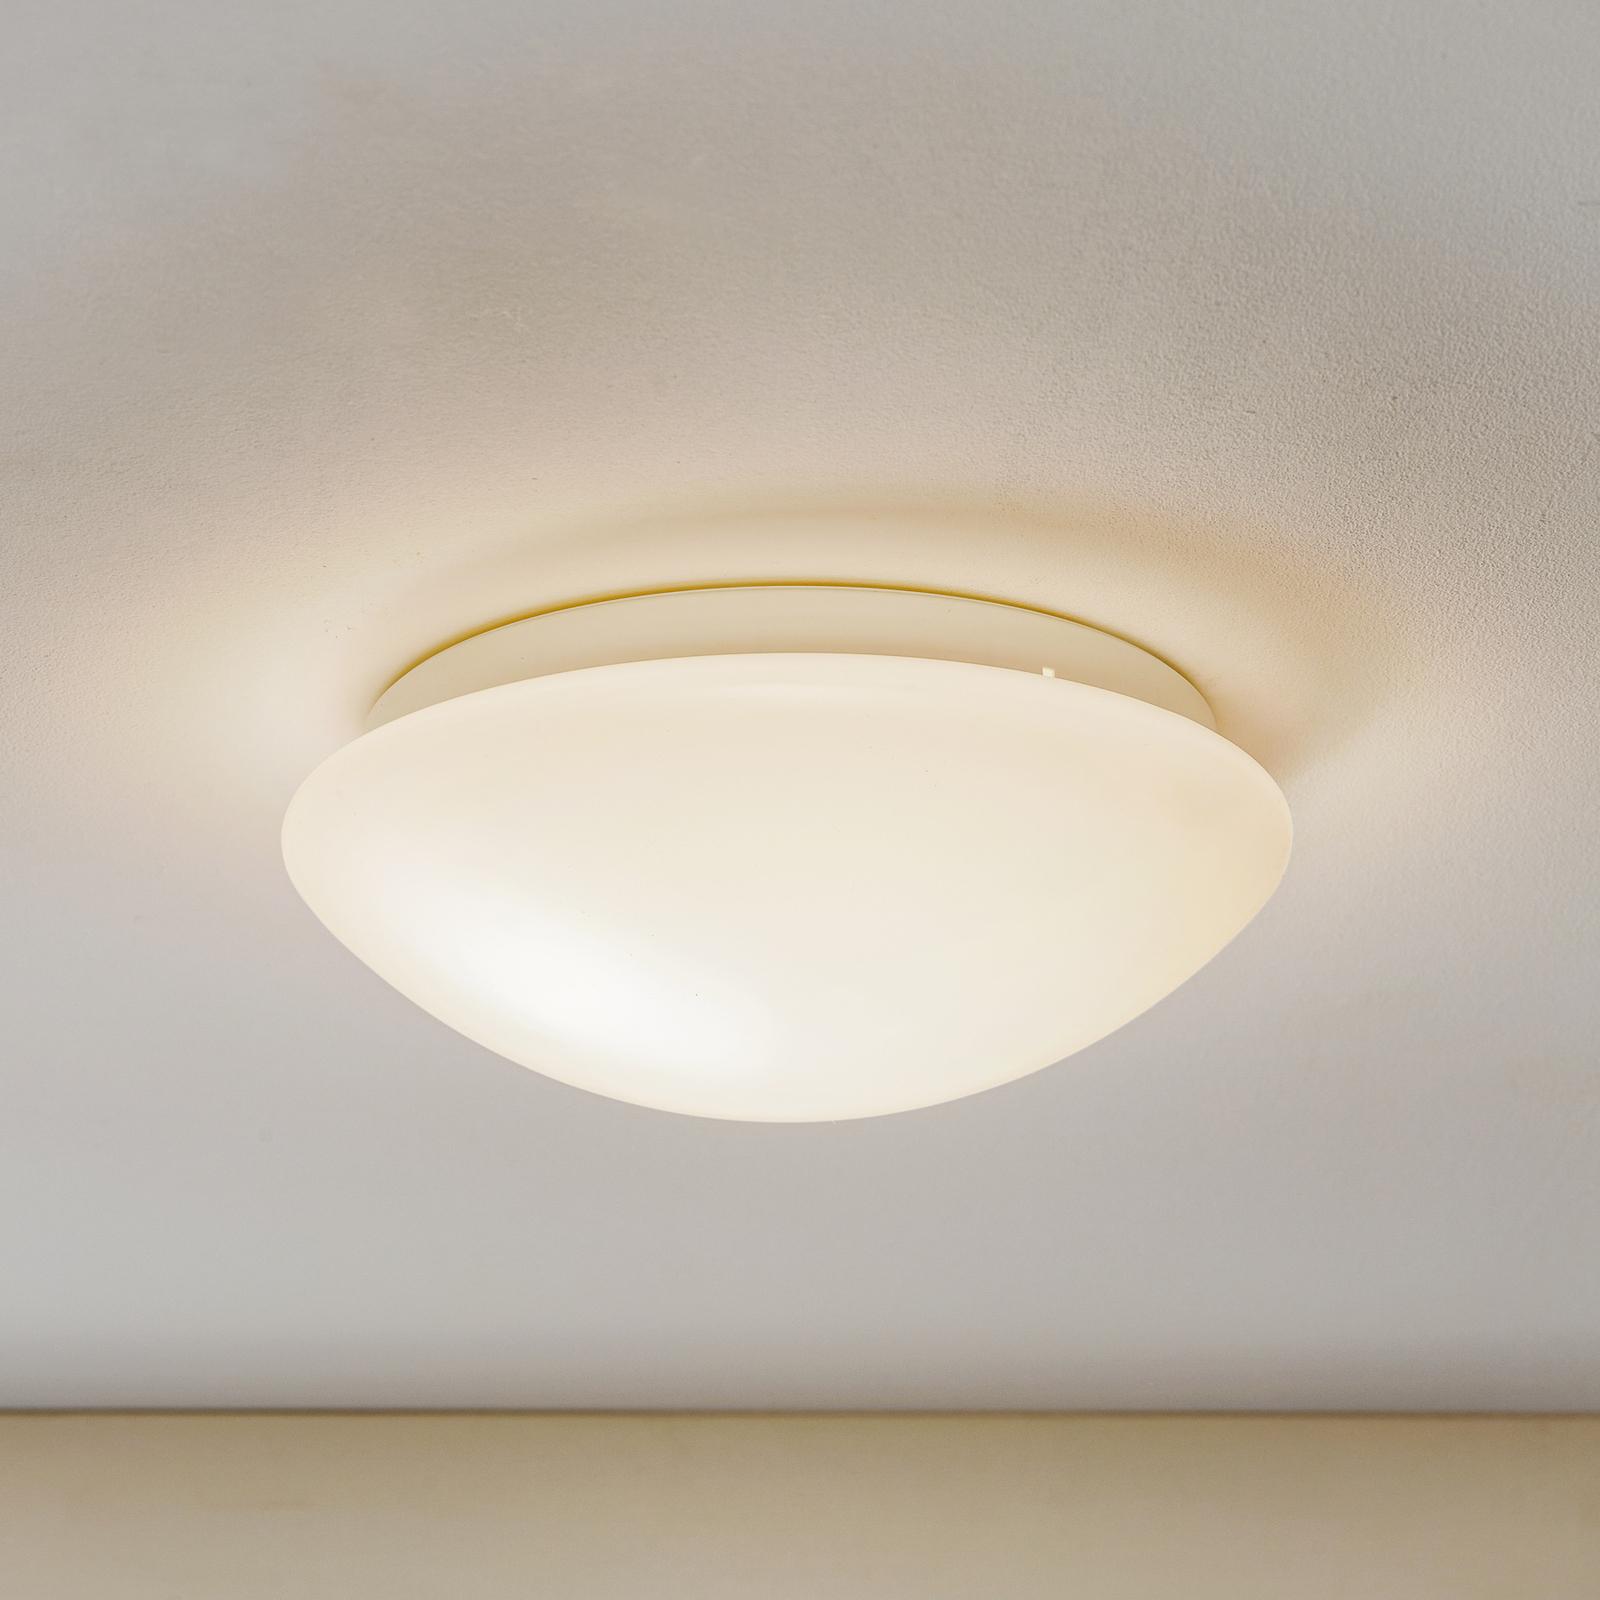 STEINEL RS PRO P1 sensor-LED-taklampe, 3000K